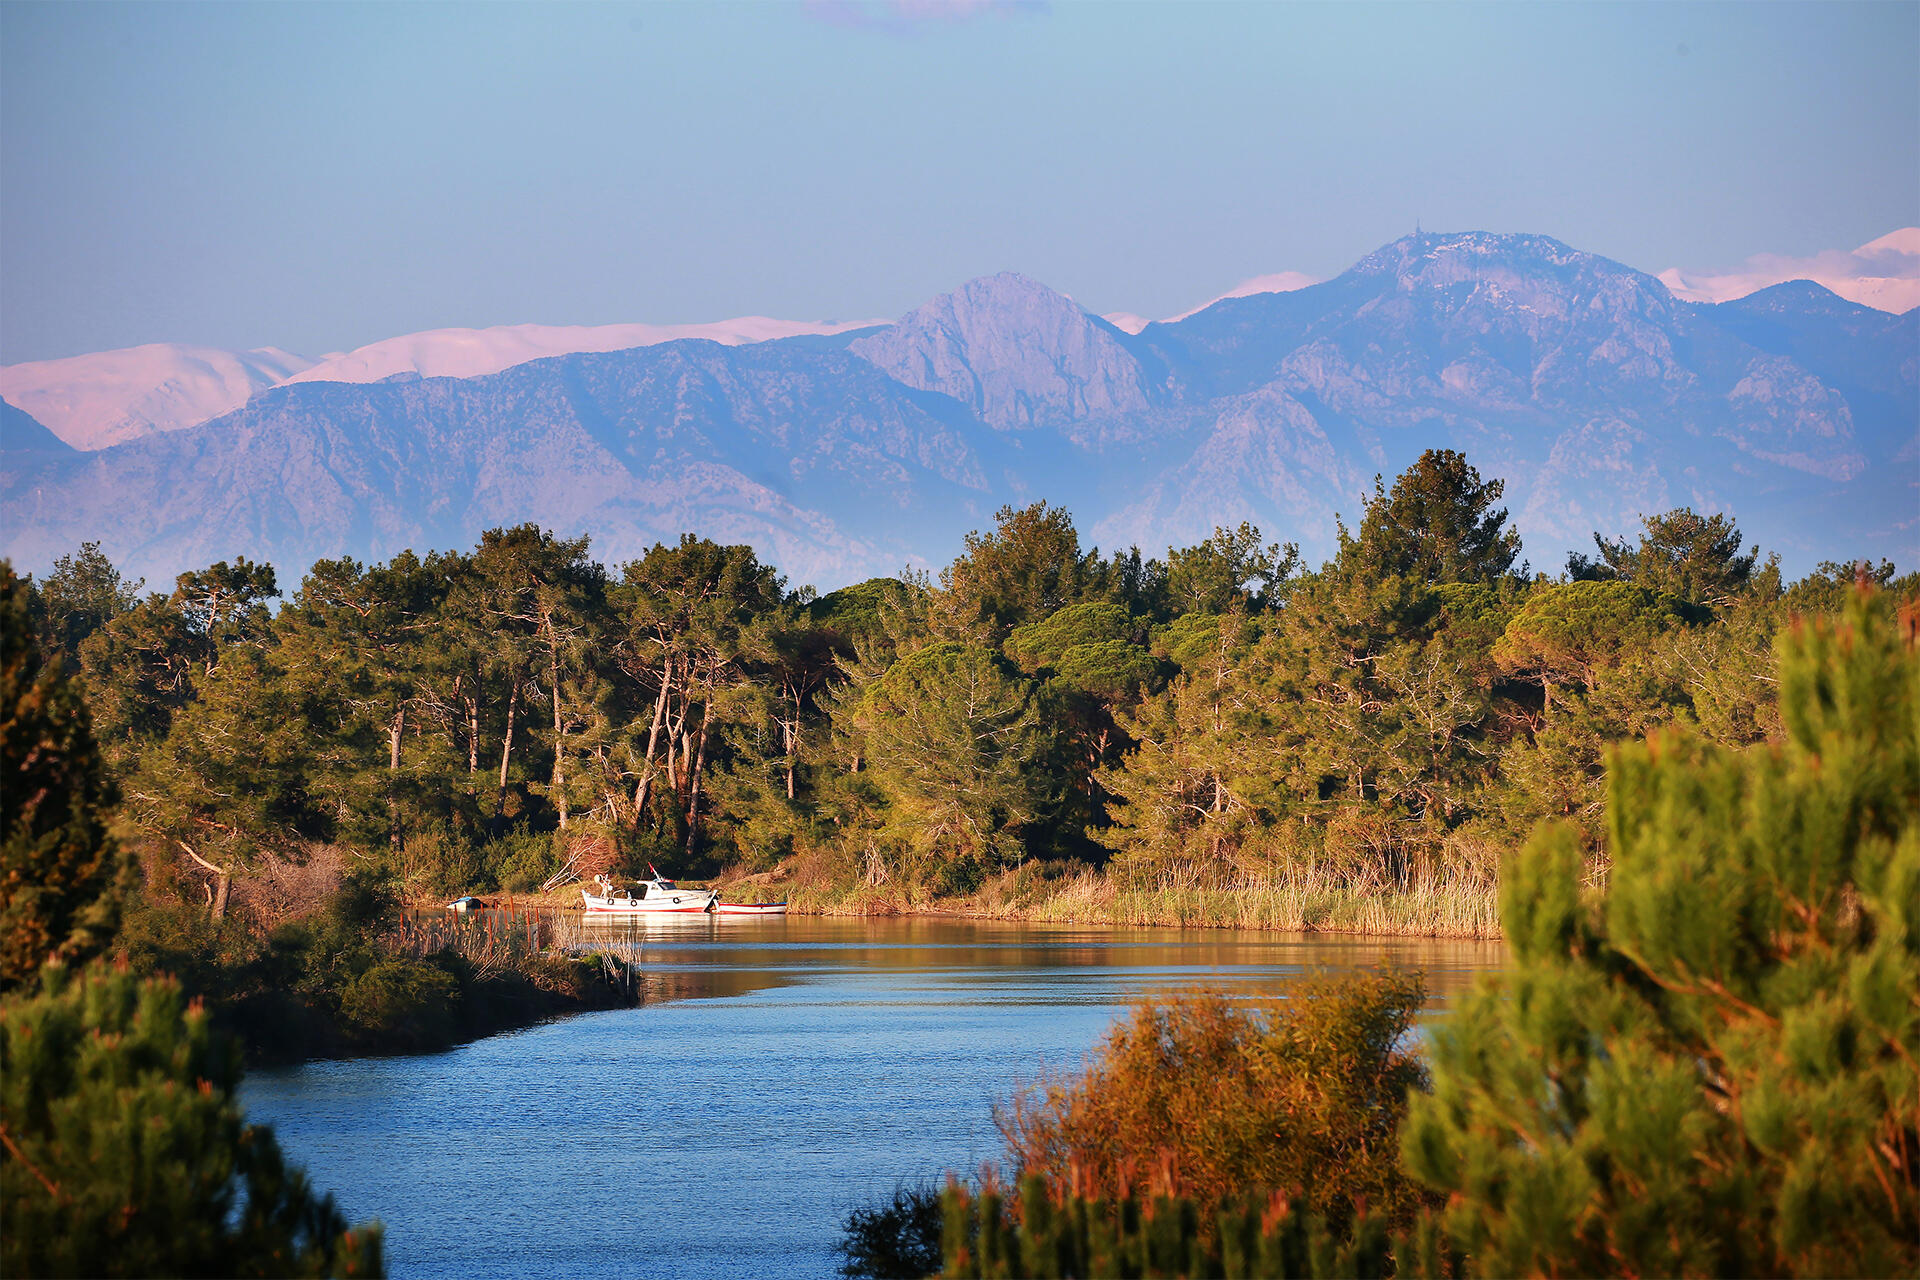 Titanic Golf Club lake and mountains